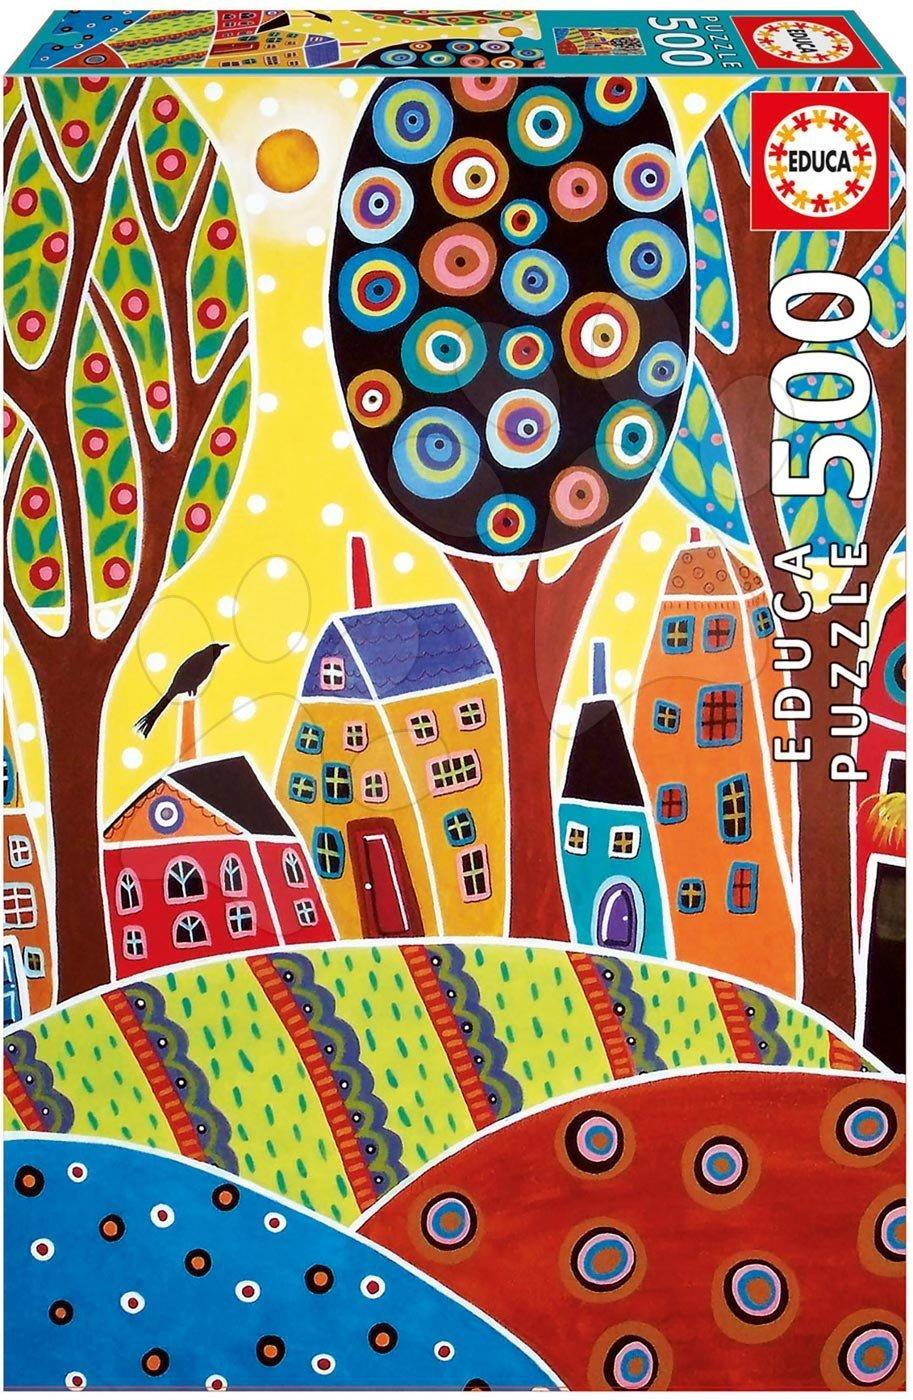 Puzzle 500 dielne - Puzzle Houses Barn Landscape, Karla Gerard Educa 500 dielov od 11 rokov